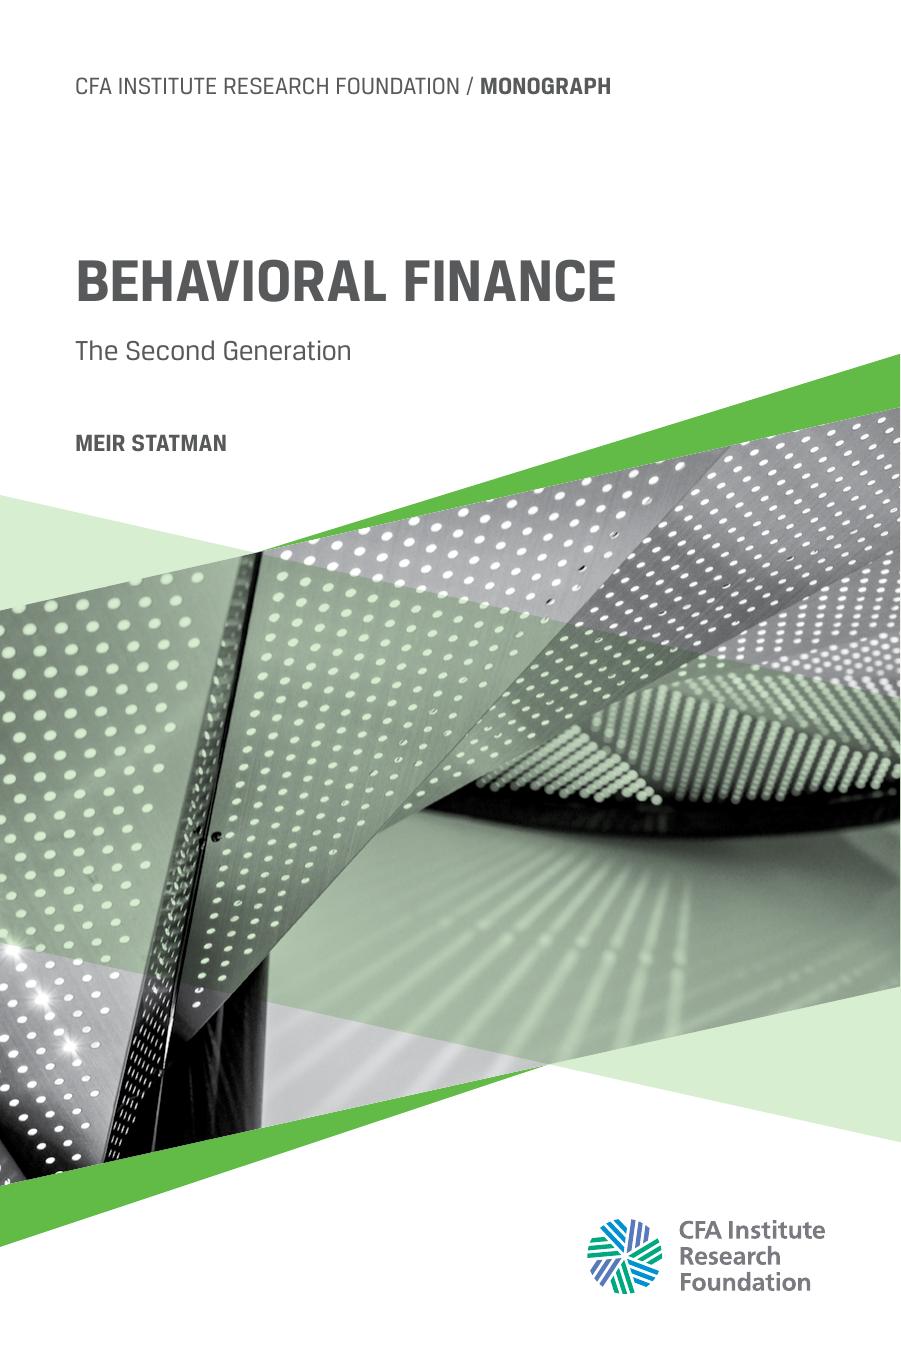 martingale betting system mathematical analysis readiness